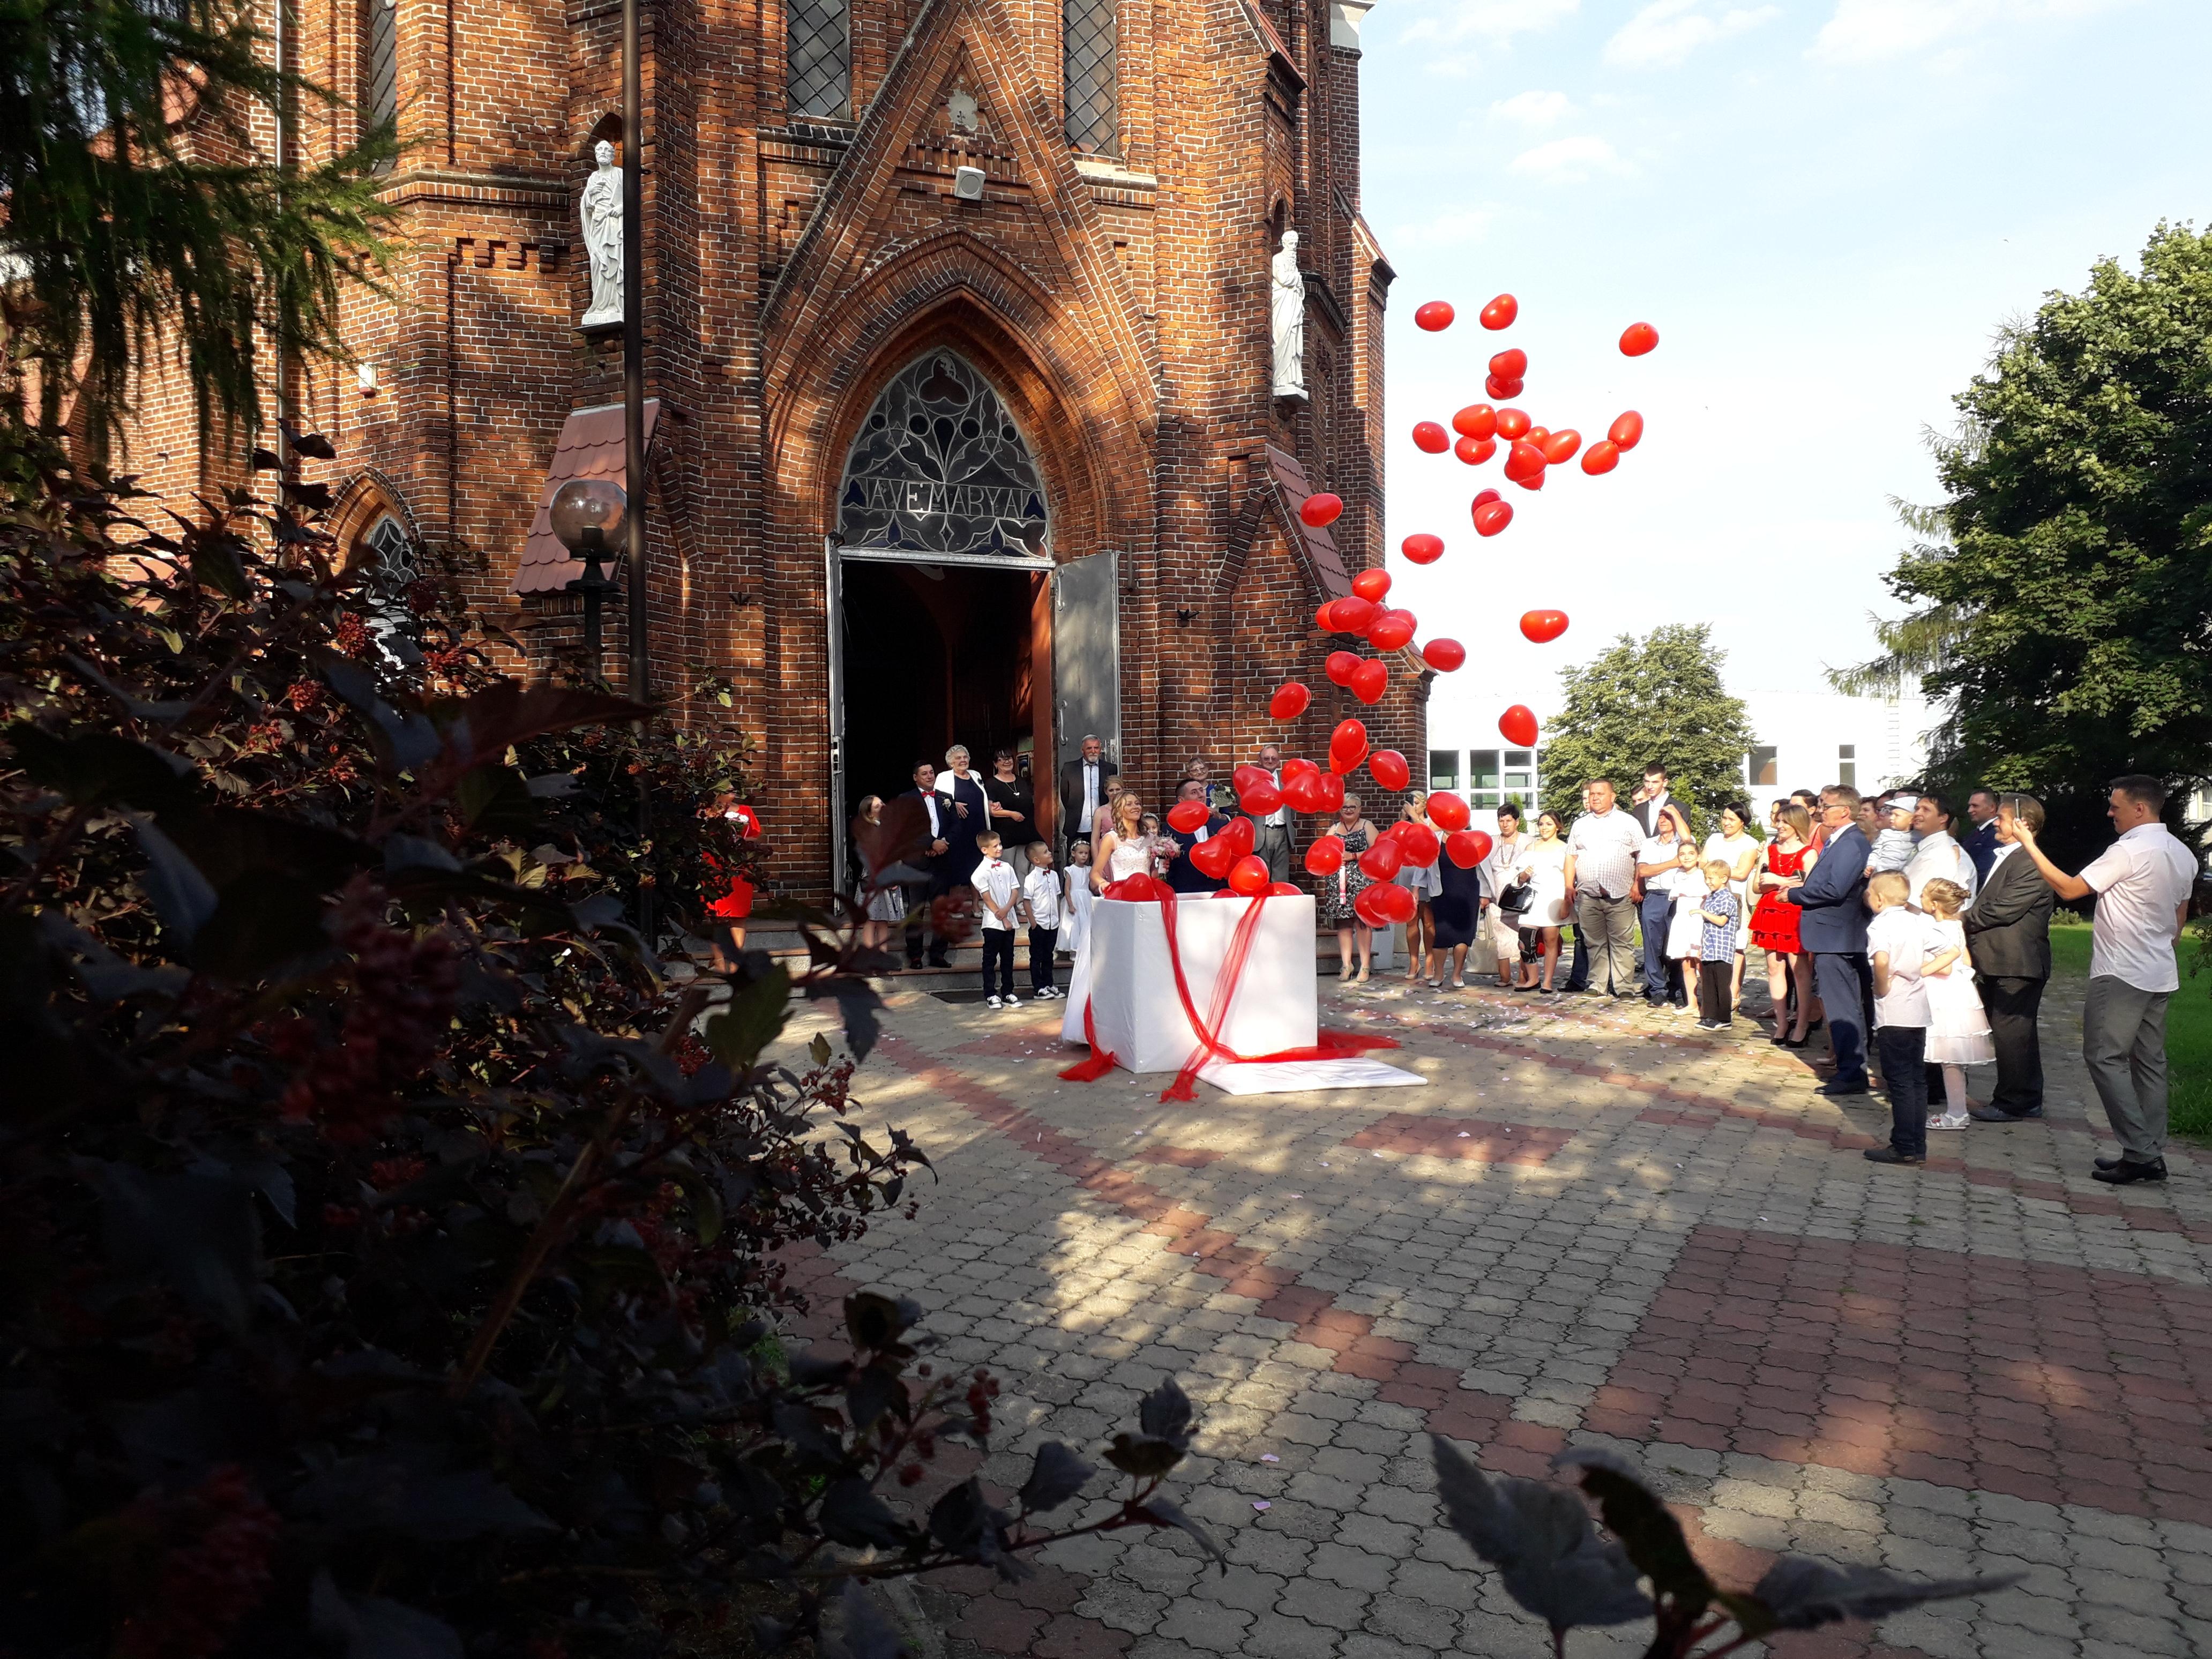 Pudła z balonami na wesele